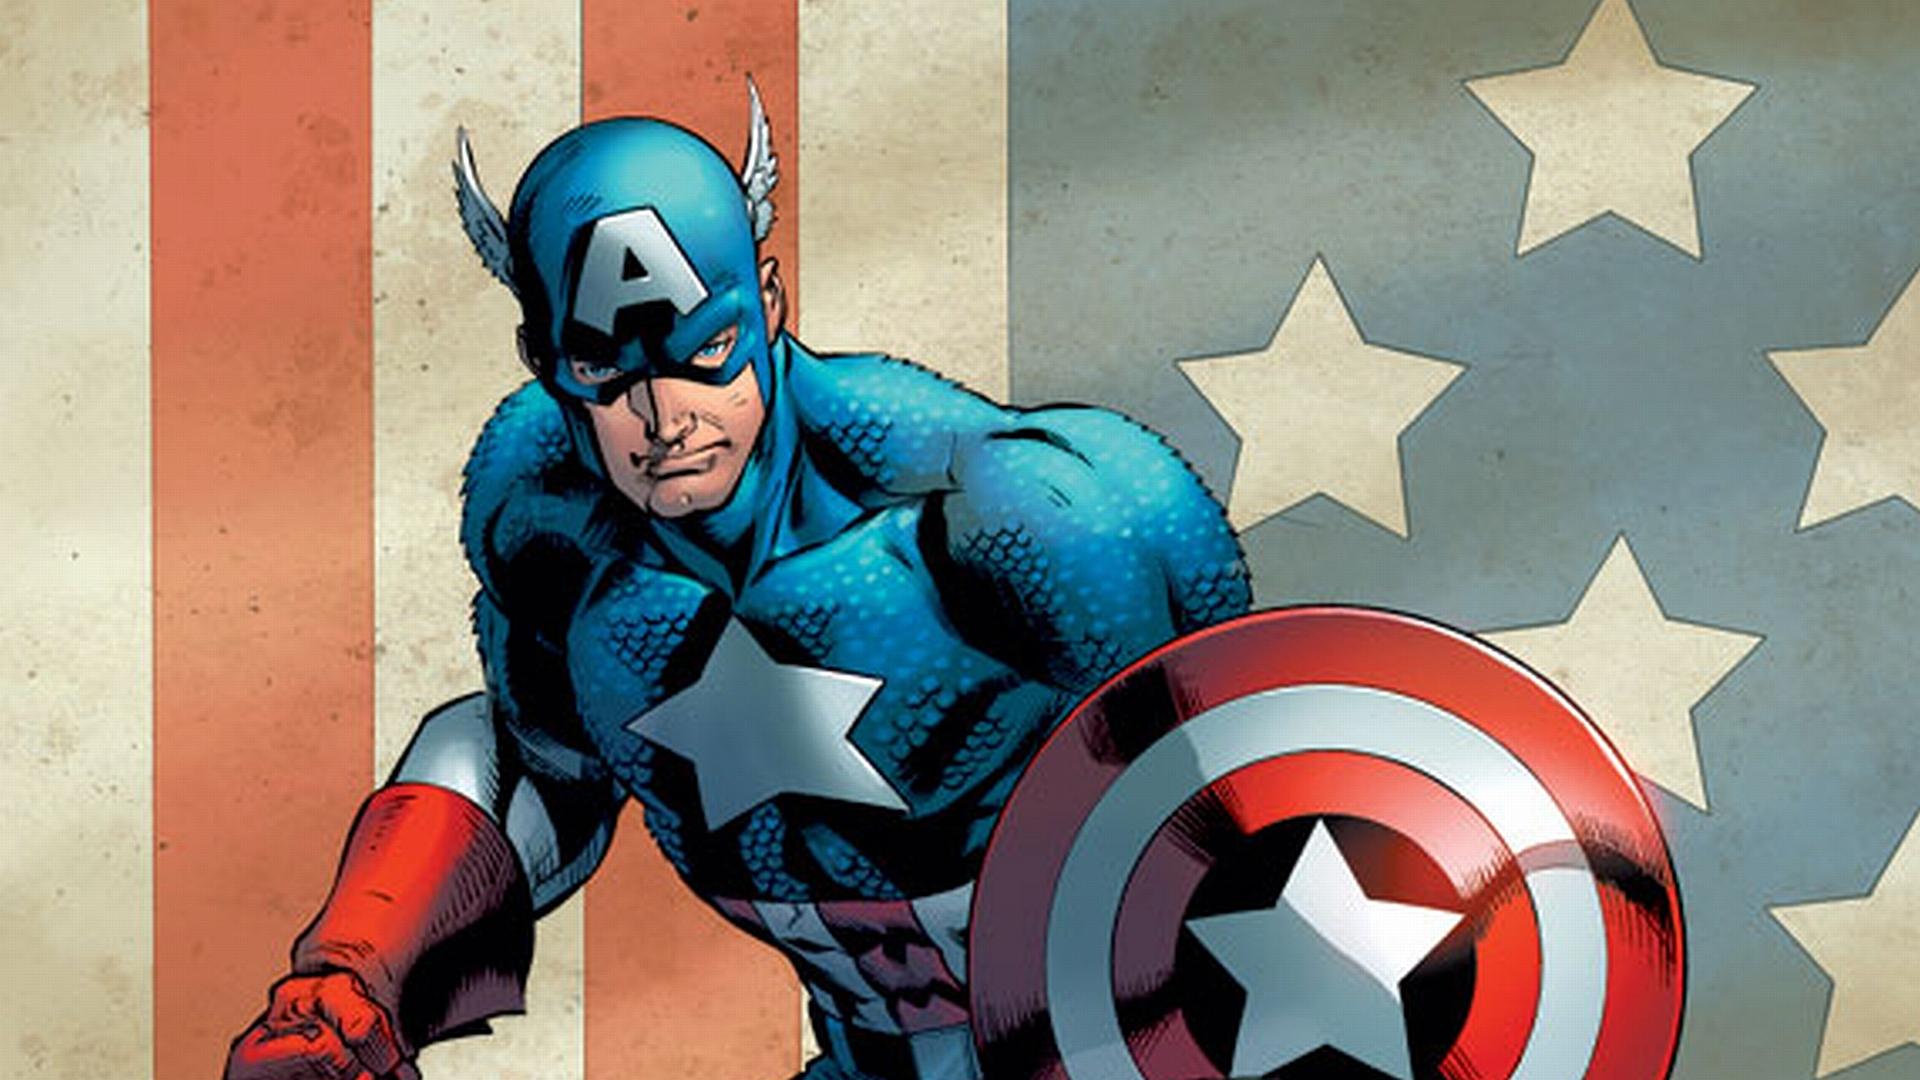 Captain America superhero wallpaper 1920x1080 39184 WallpaperUP 1920x1080